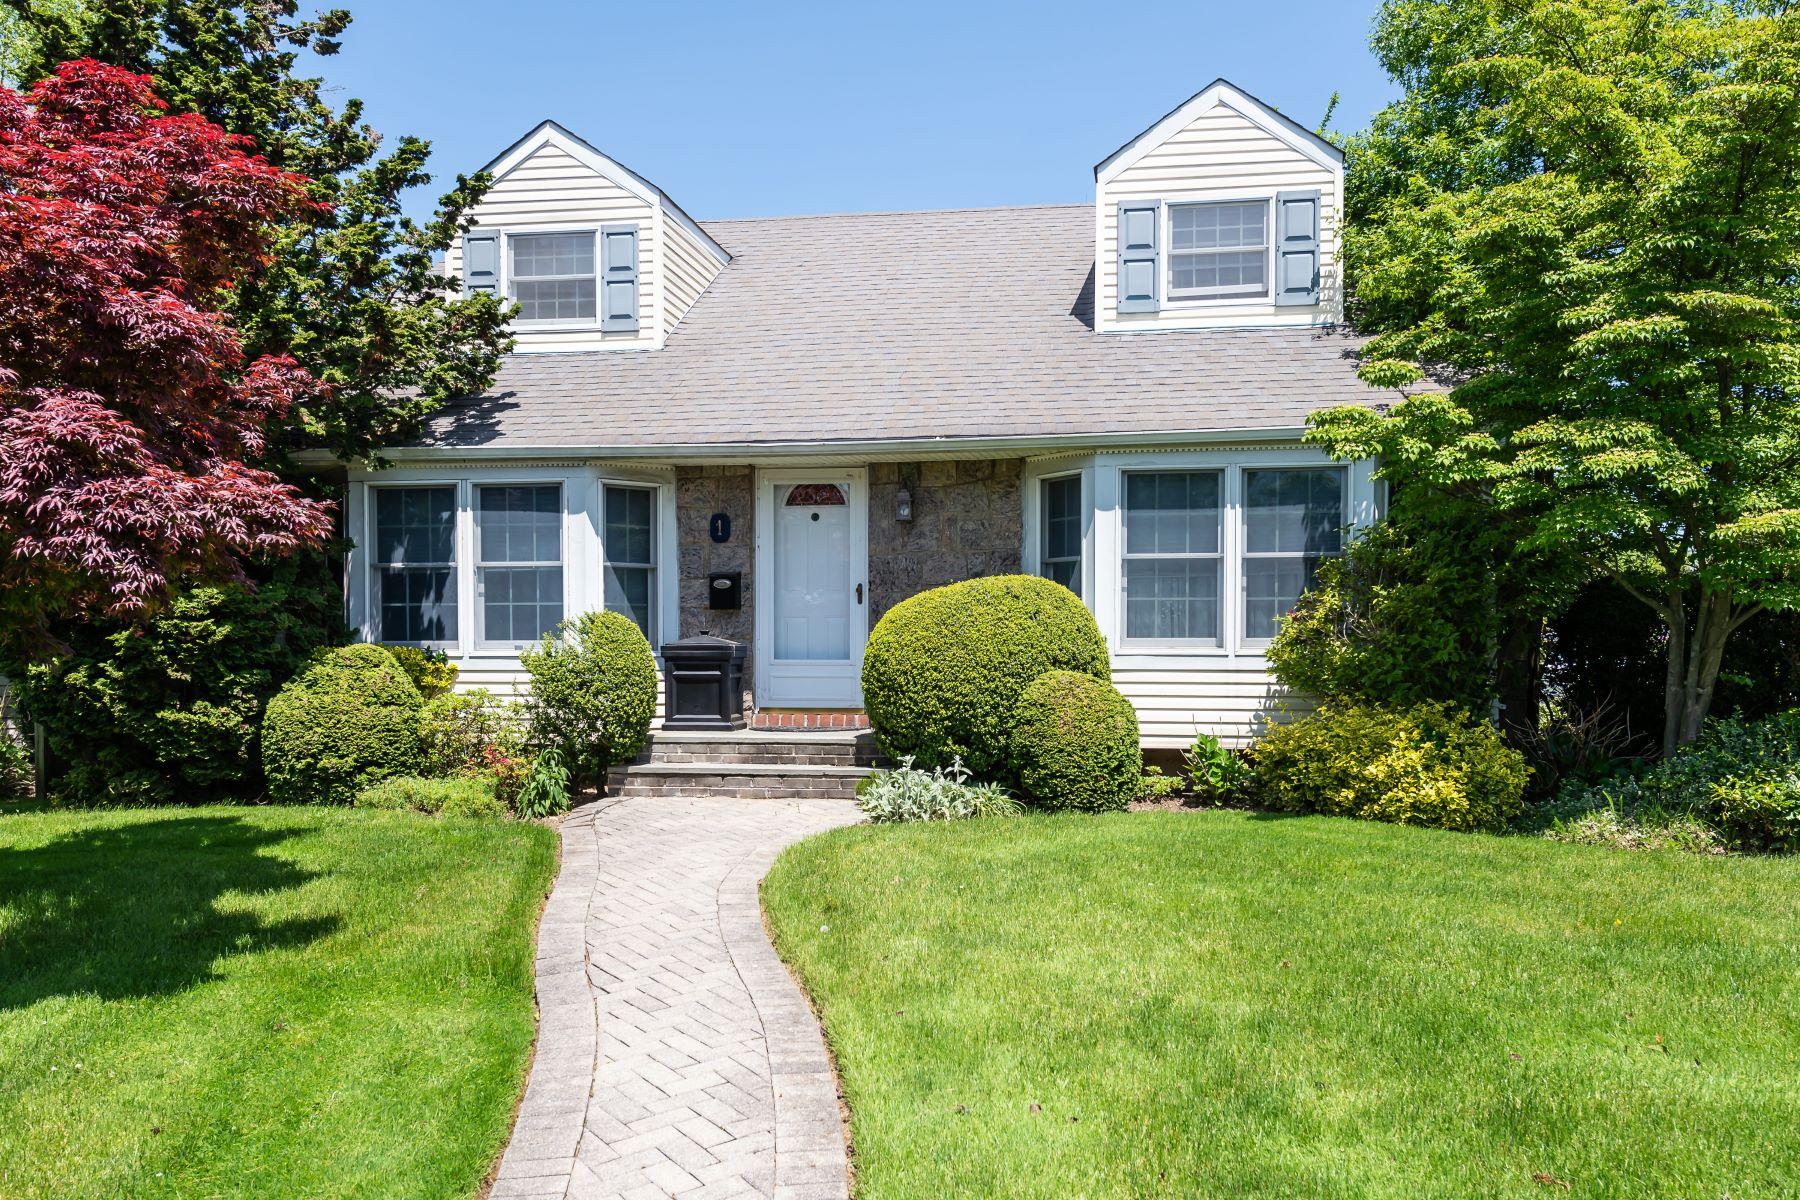 Single Family Homes für Verkauf beim Carle Place 1 Southview Ct, Carle Place, New York 11514 Vereinigte Staaten